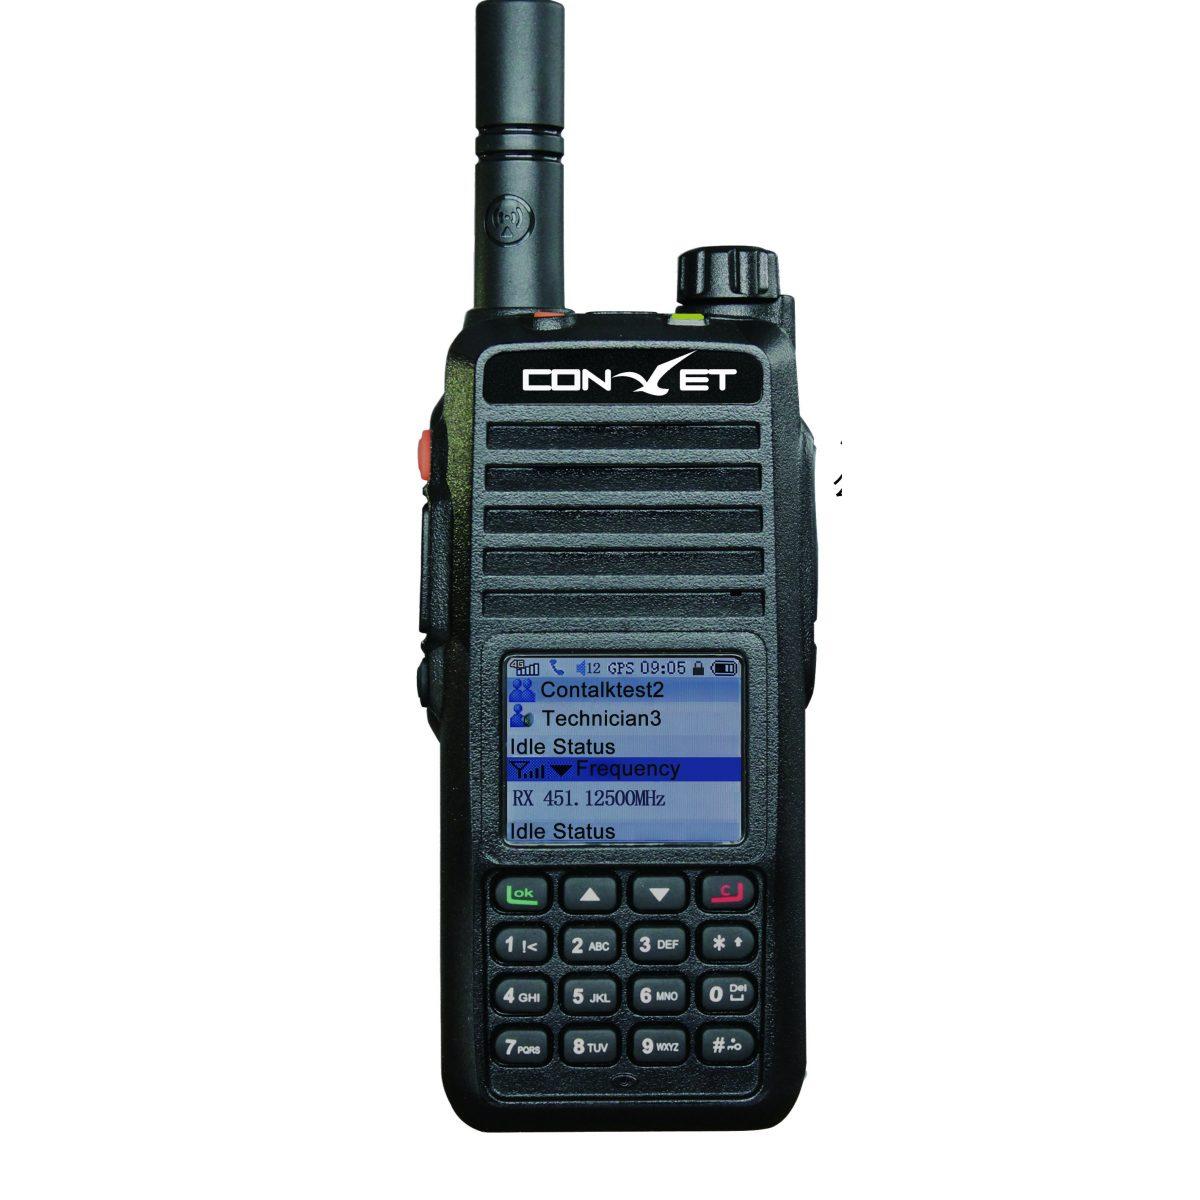 Poc radio, 4G LTE radio, POC and analog dual mode